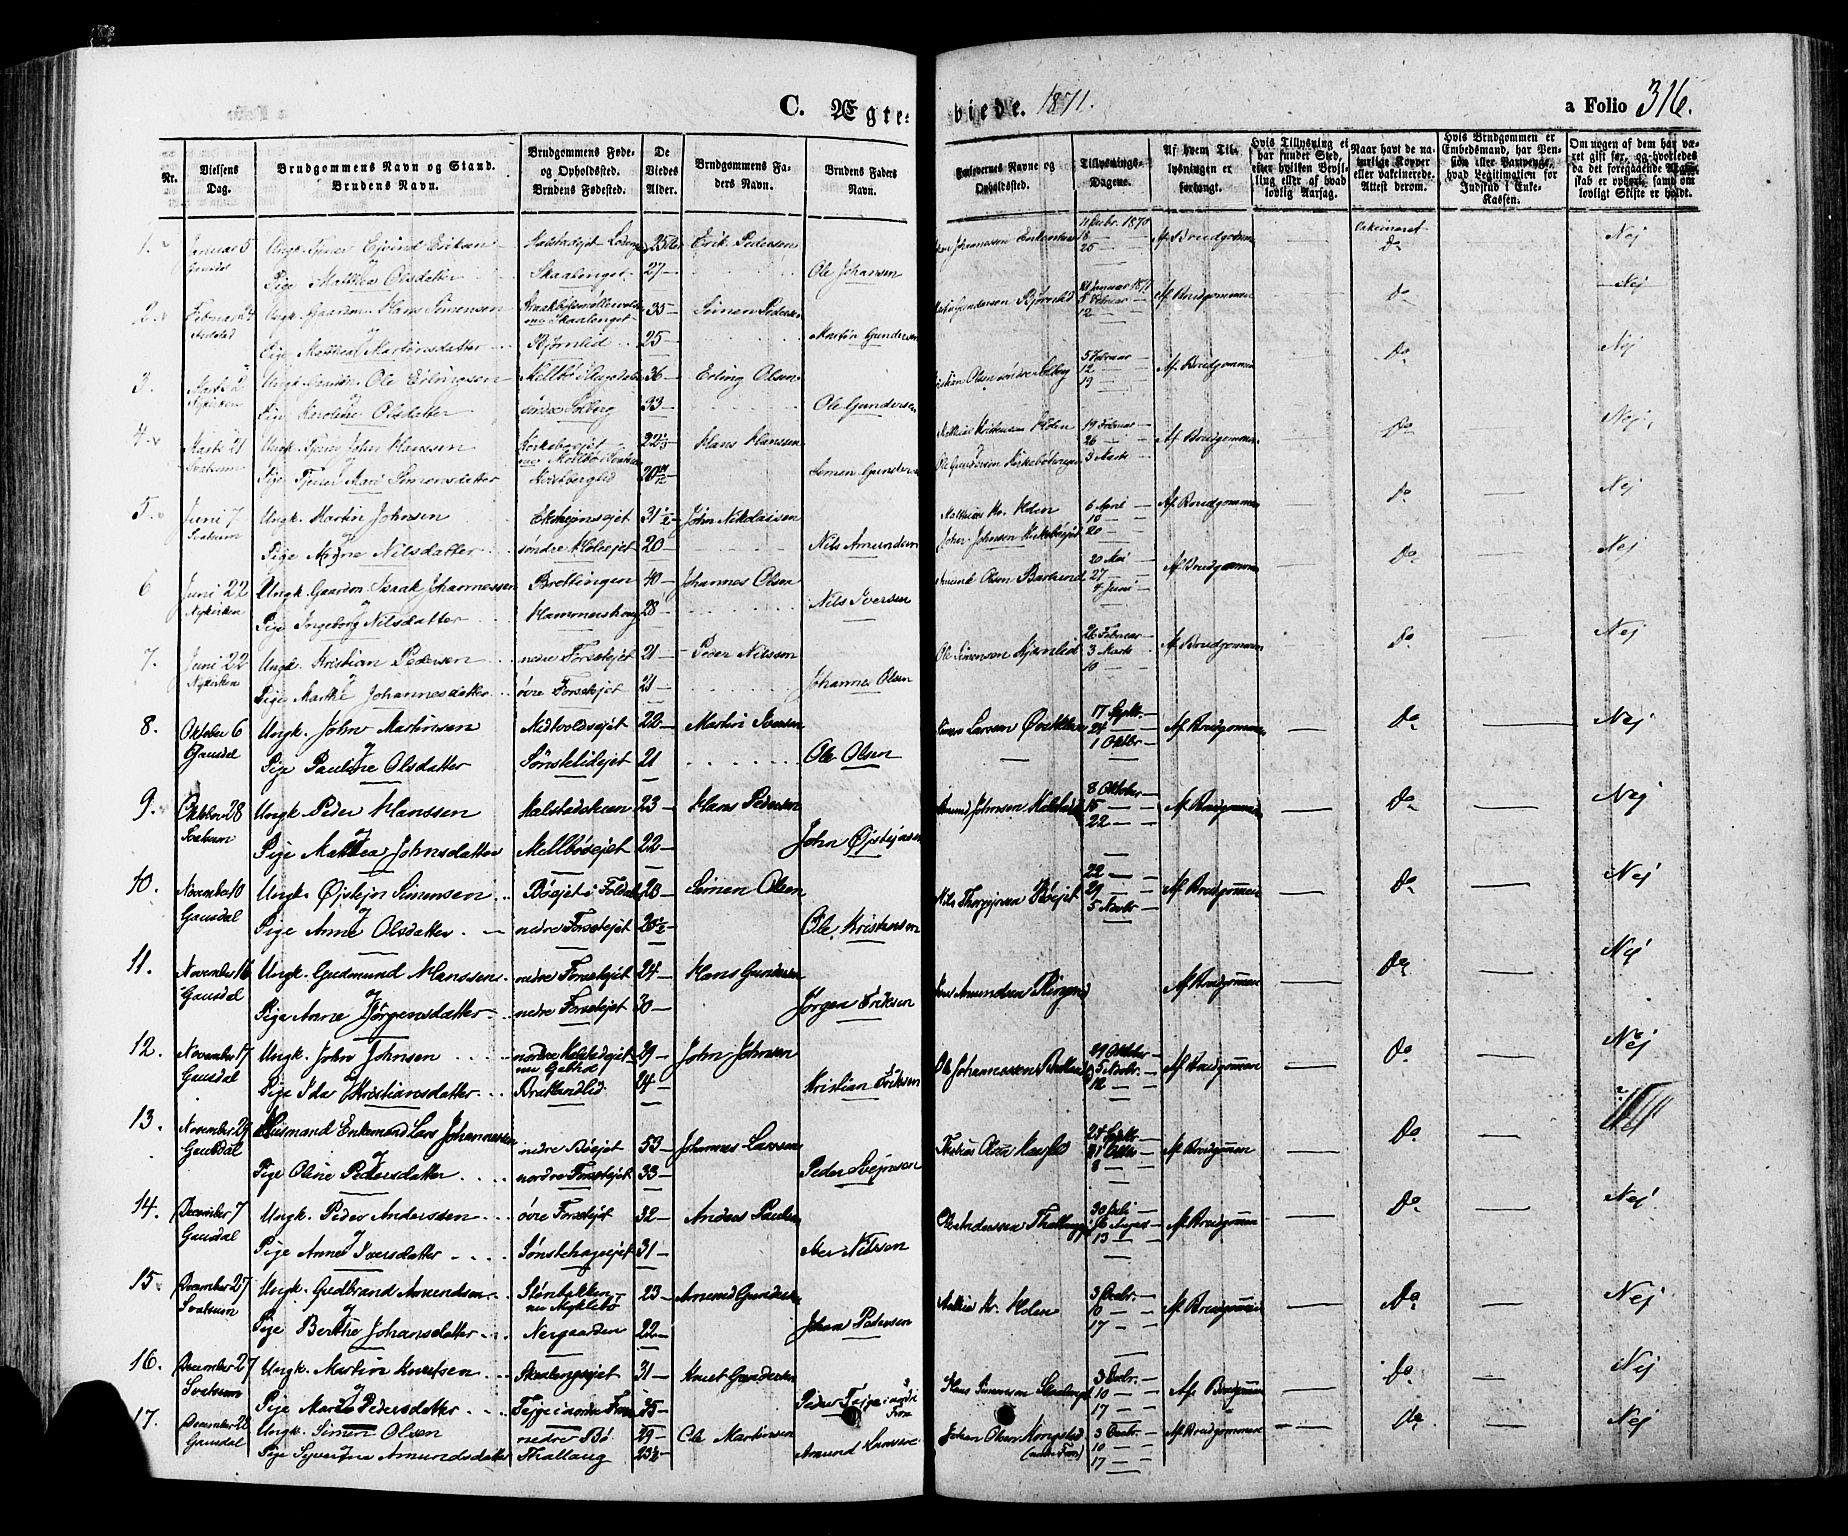 SAH, Gausdal prestekontor, Ministerialbok nr. 10, 1867-1886, s. 316